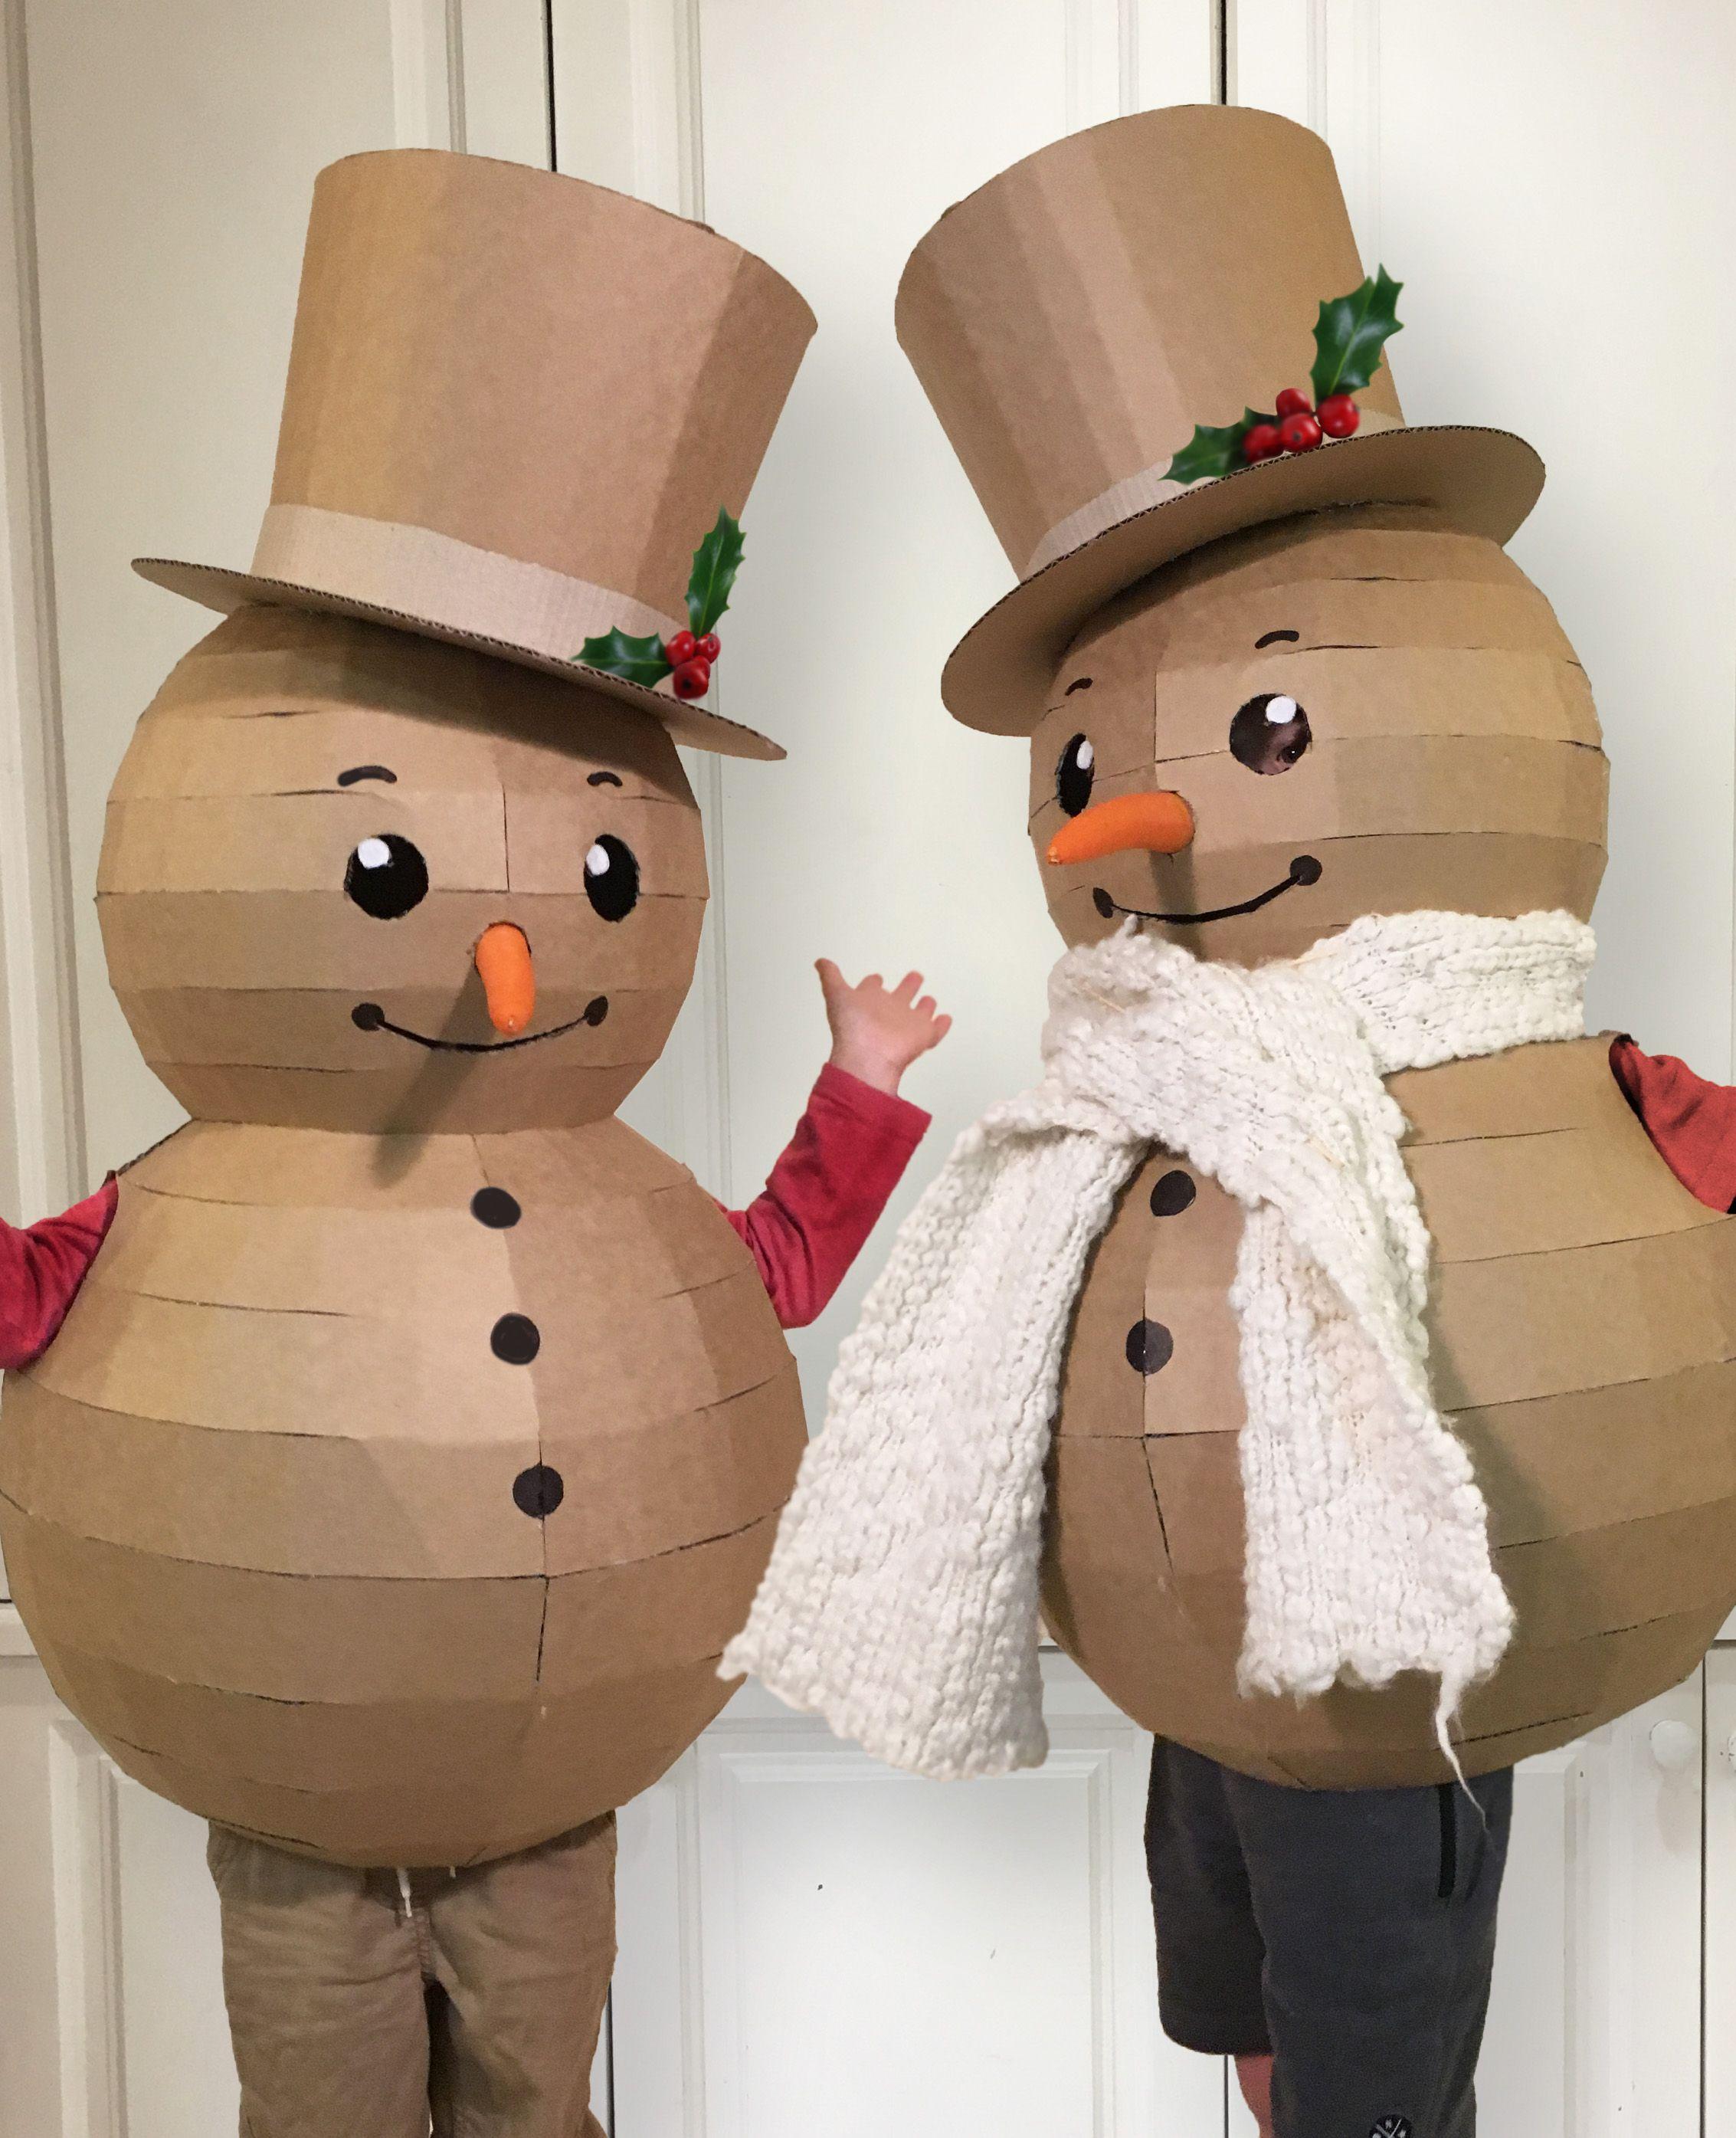 DIY CARDBOARD SNOWMAN COSTUME (With images) | Cardboard ...